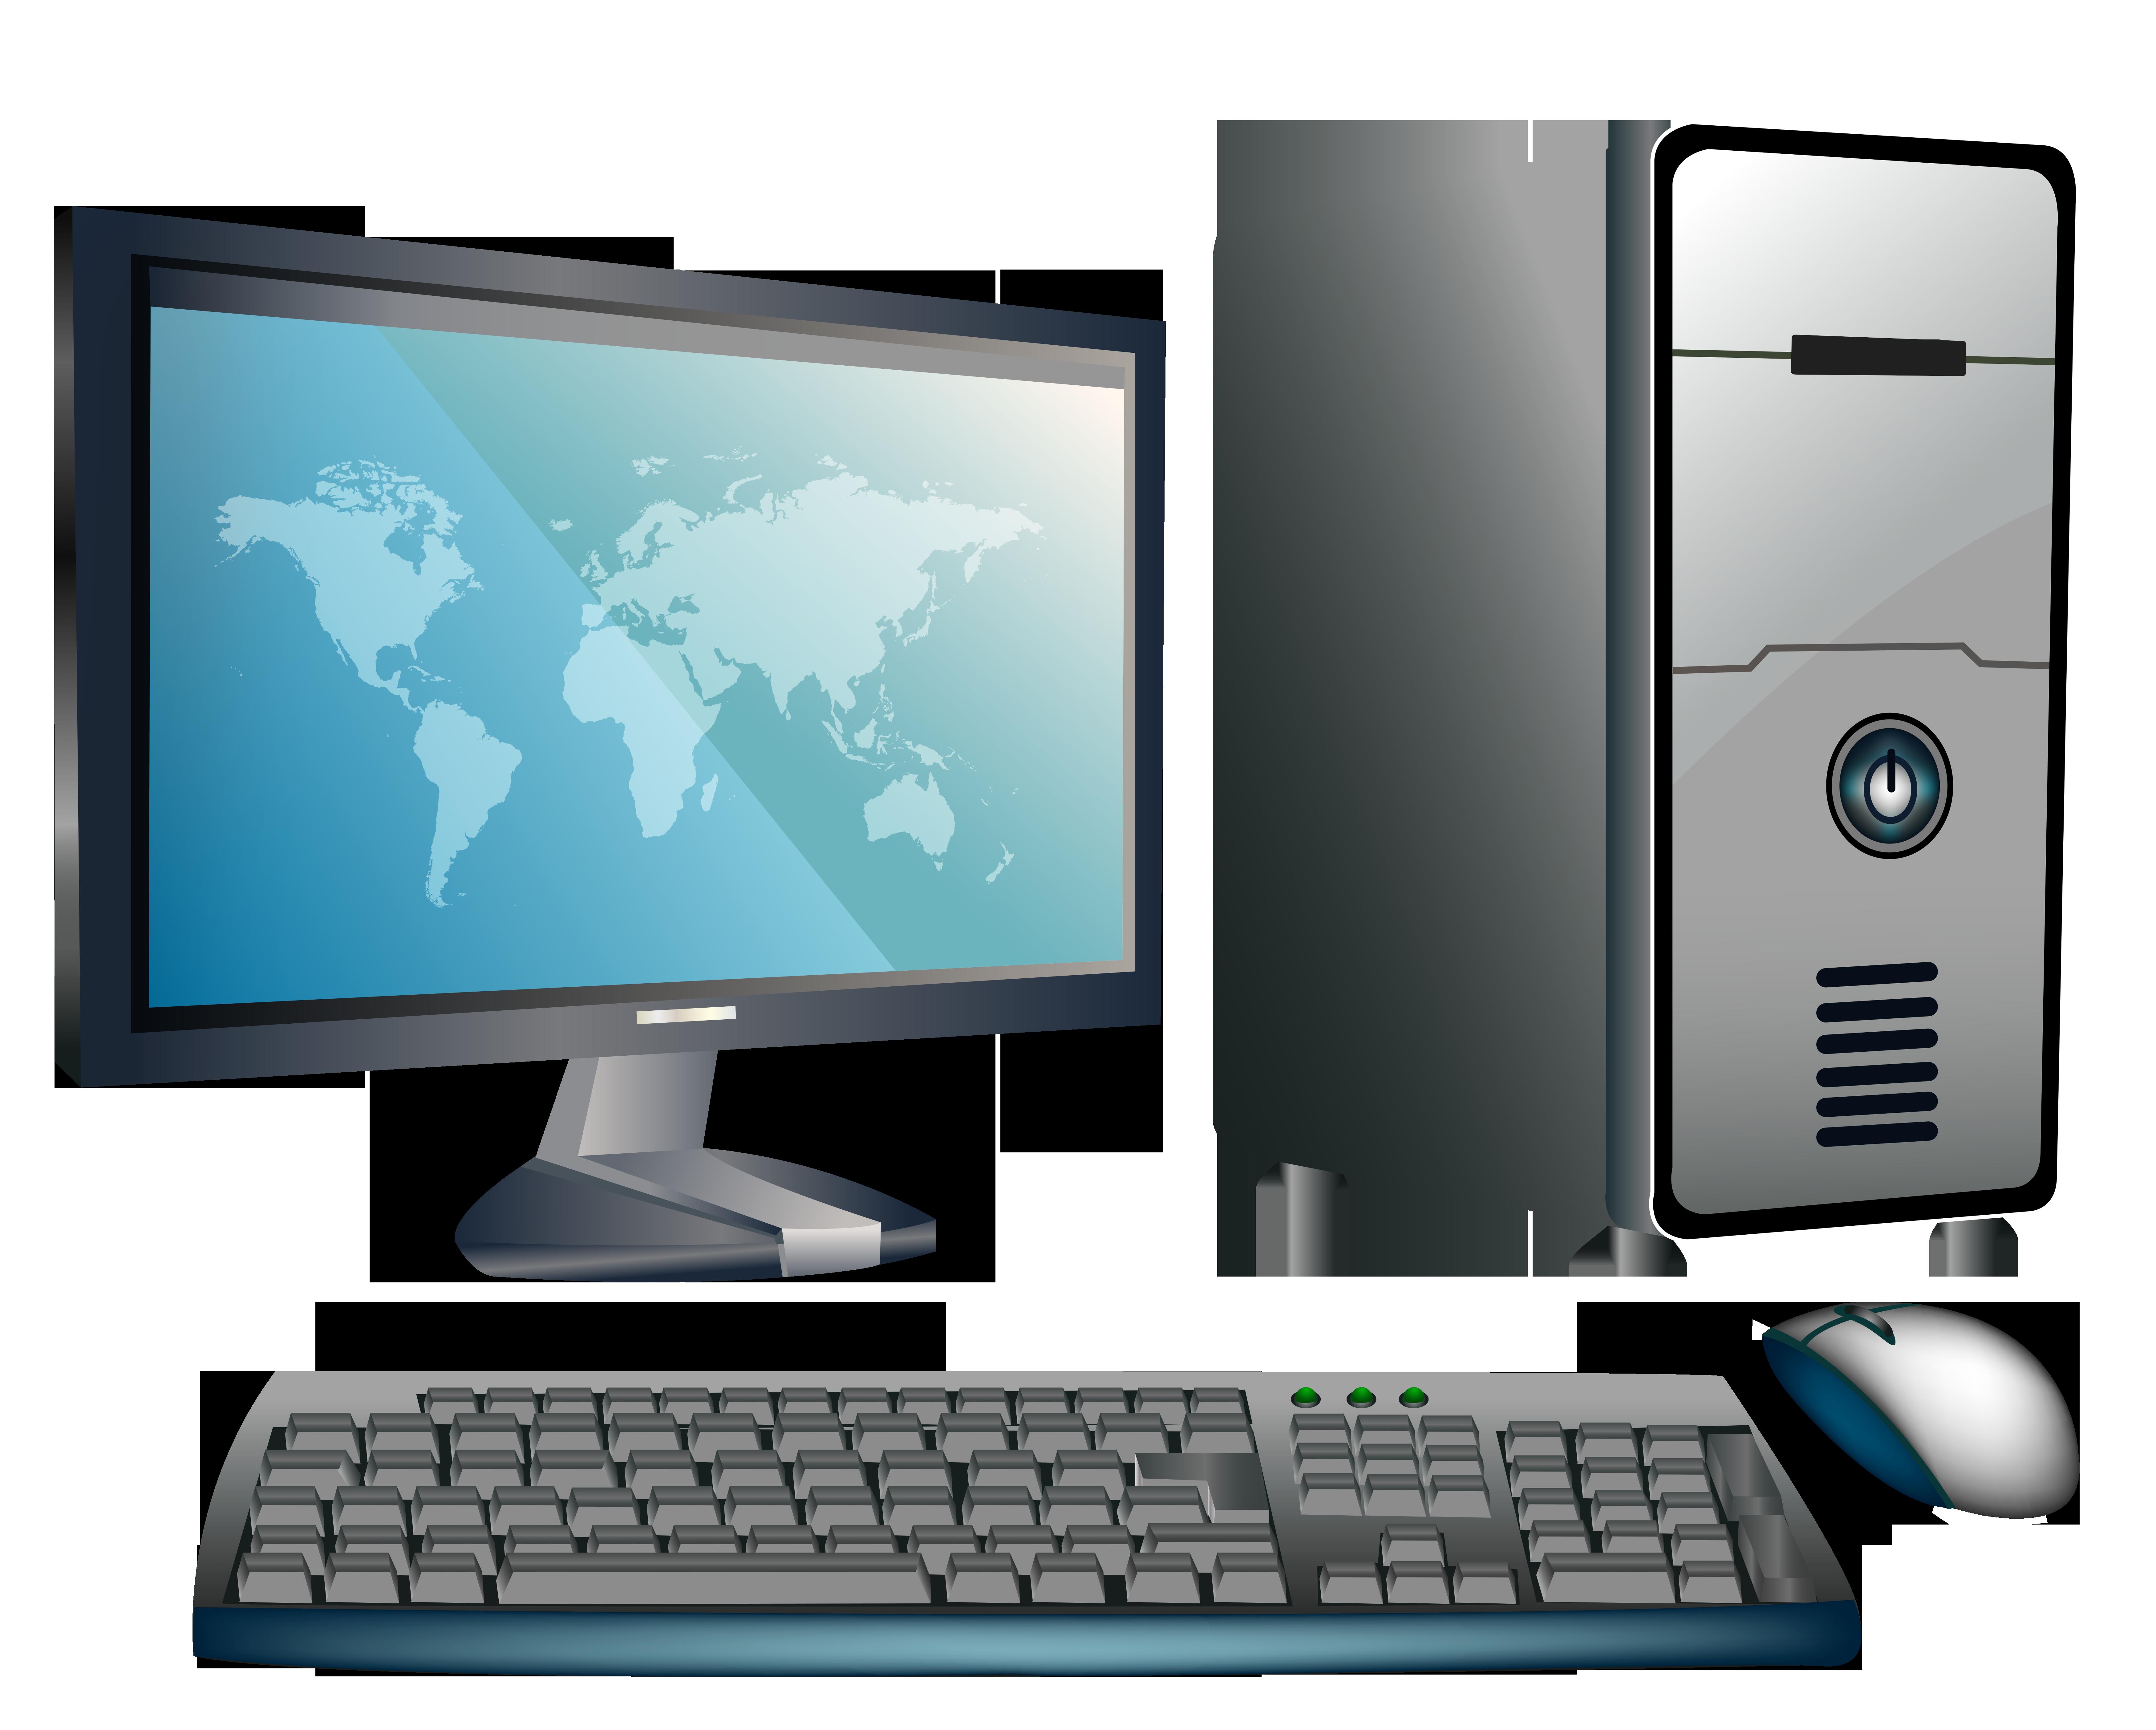 Clipart computer. Desktop png best web